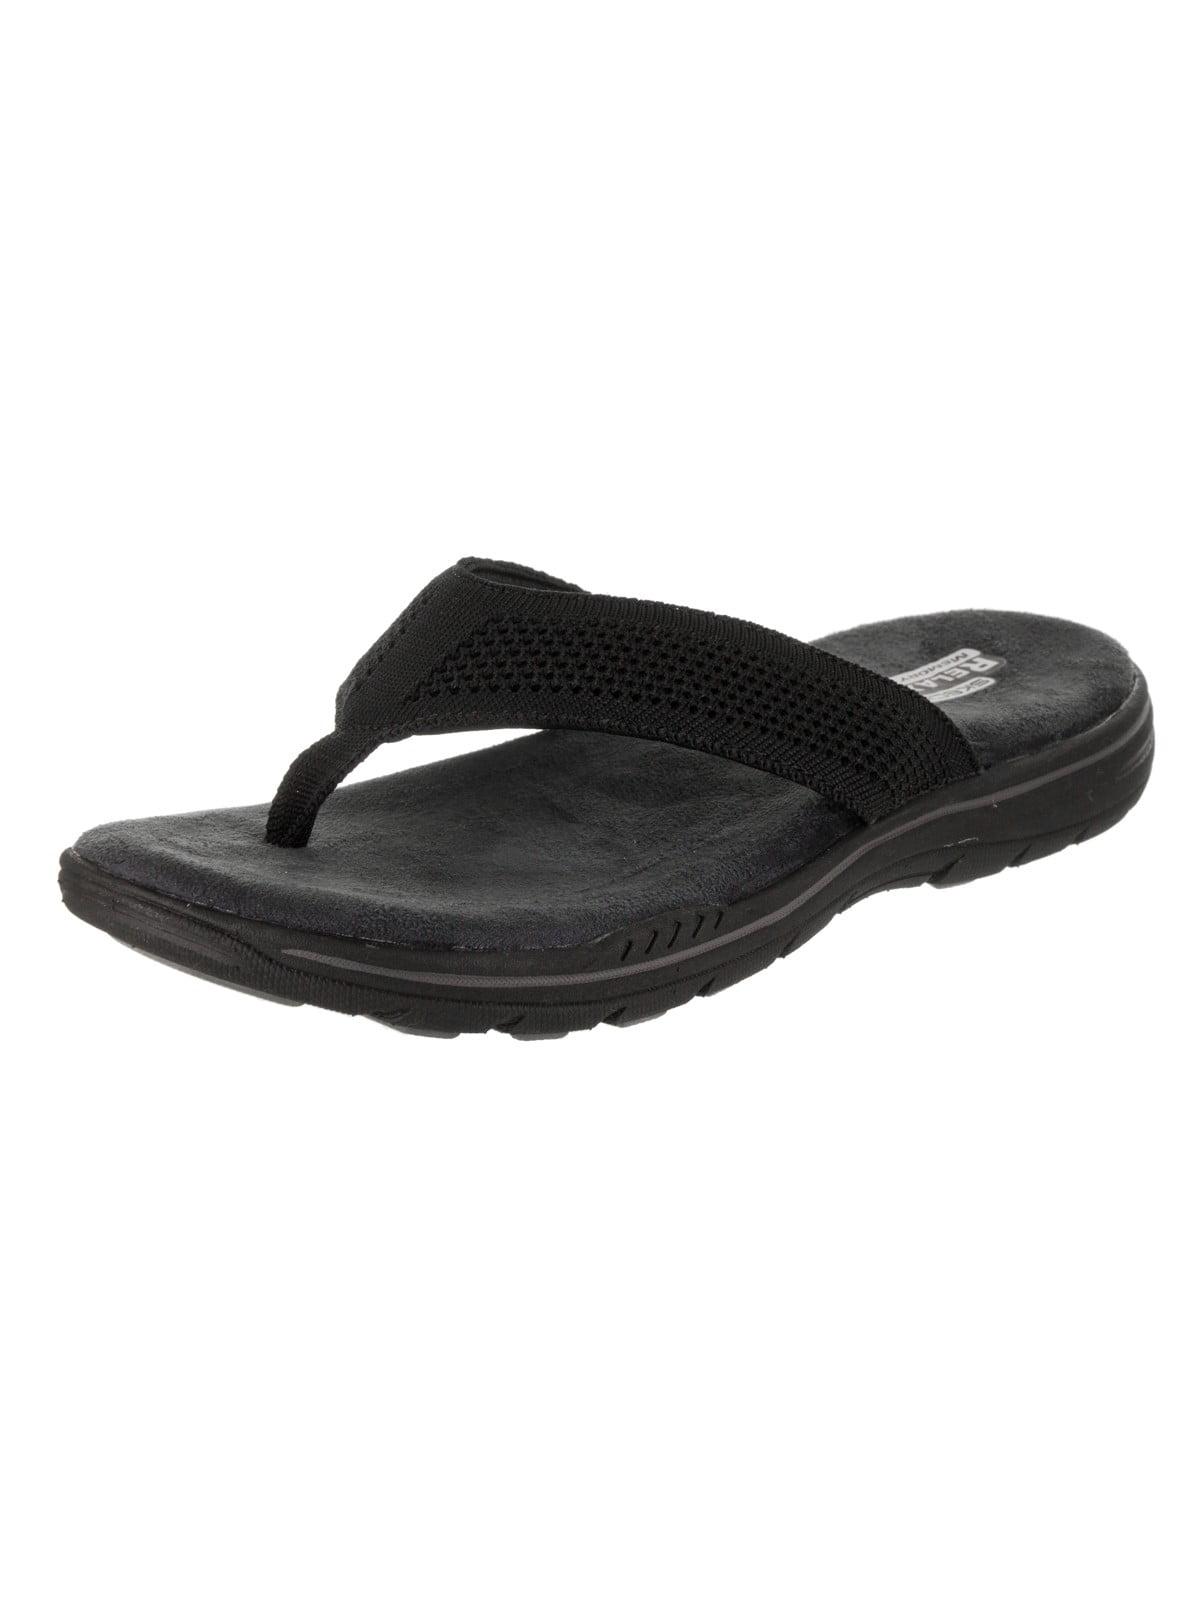 04c7893a0fbd Skechers Men s Evented - Borte Sandal - Walmart.com